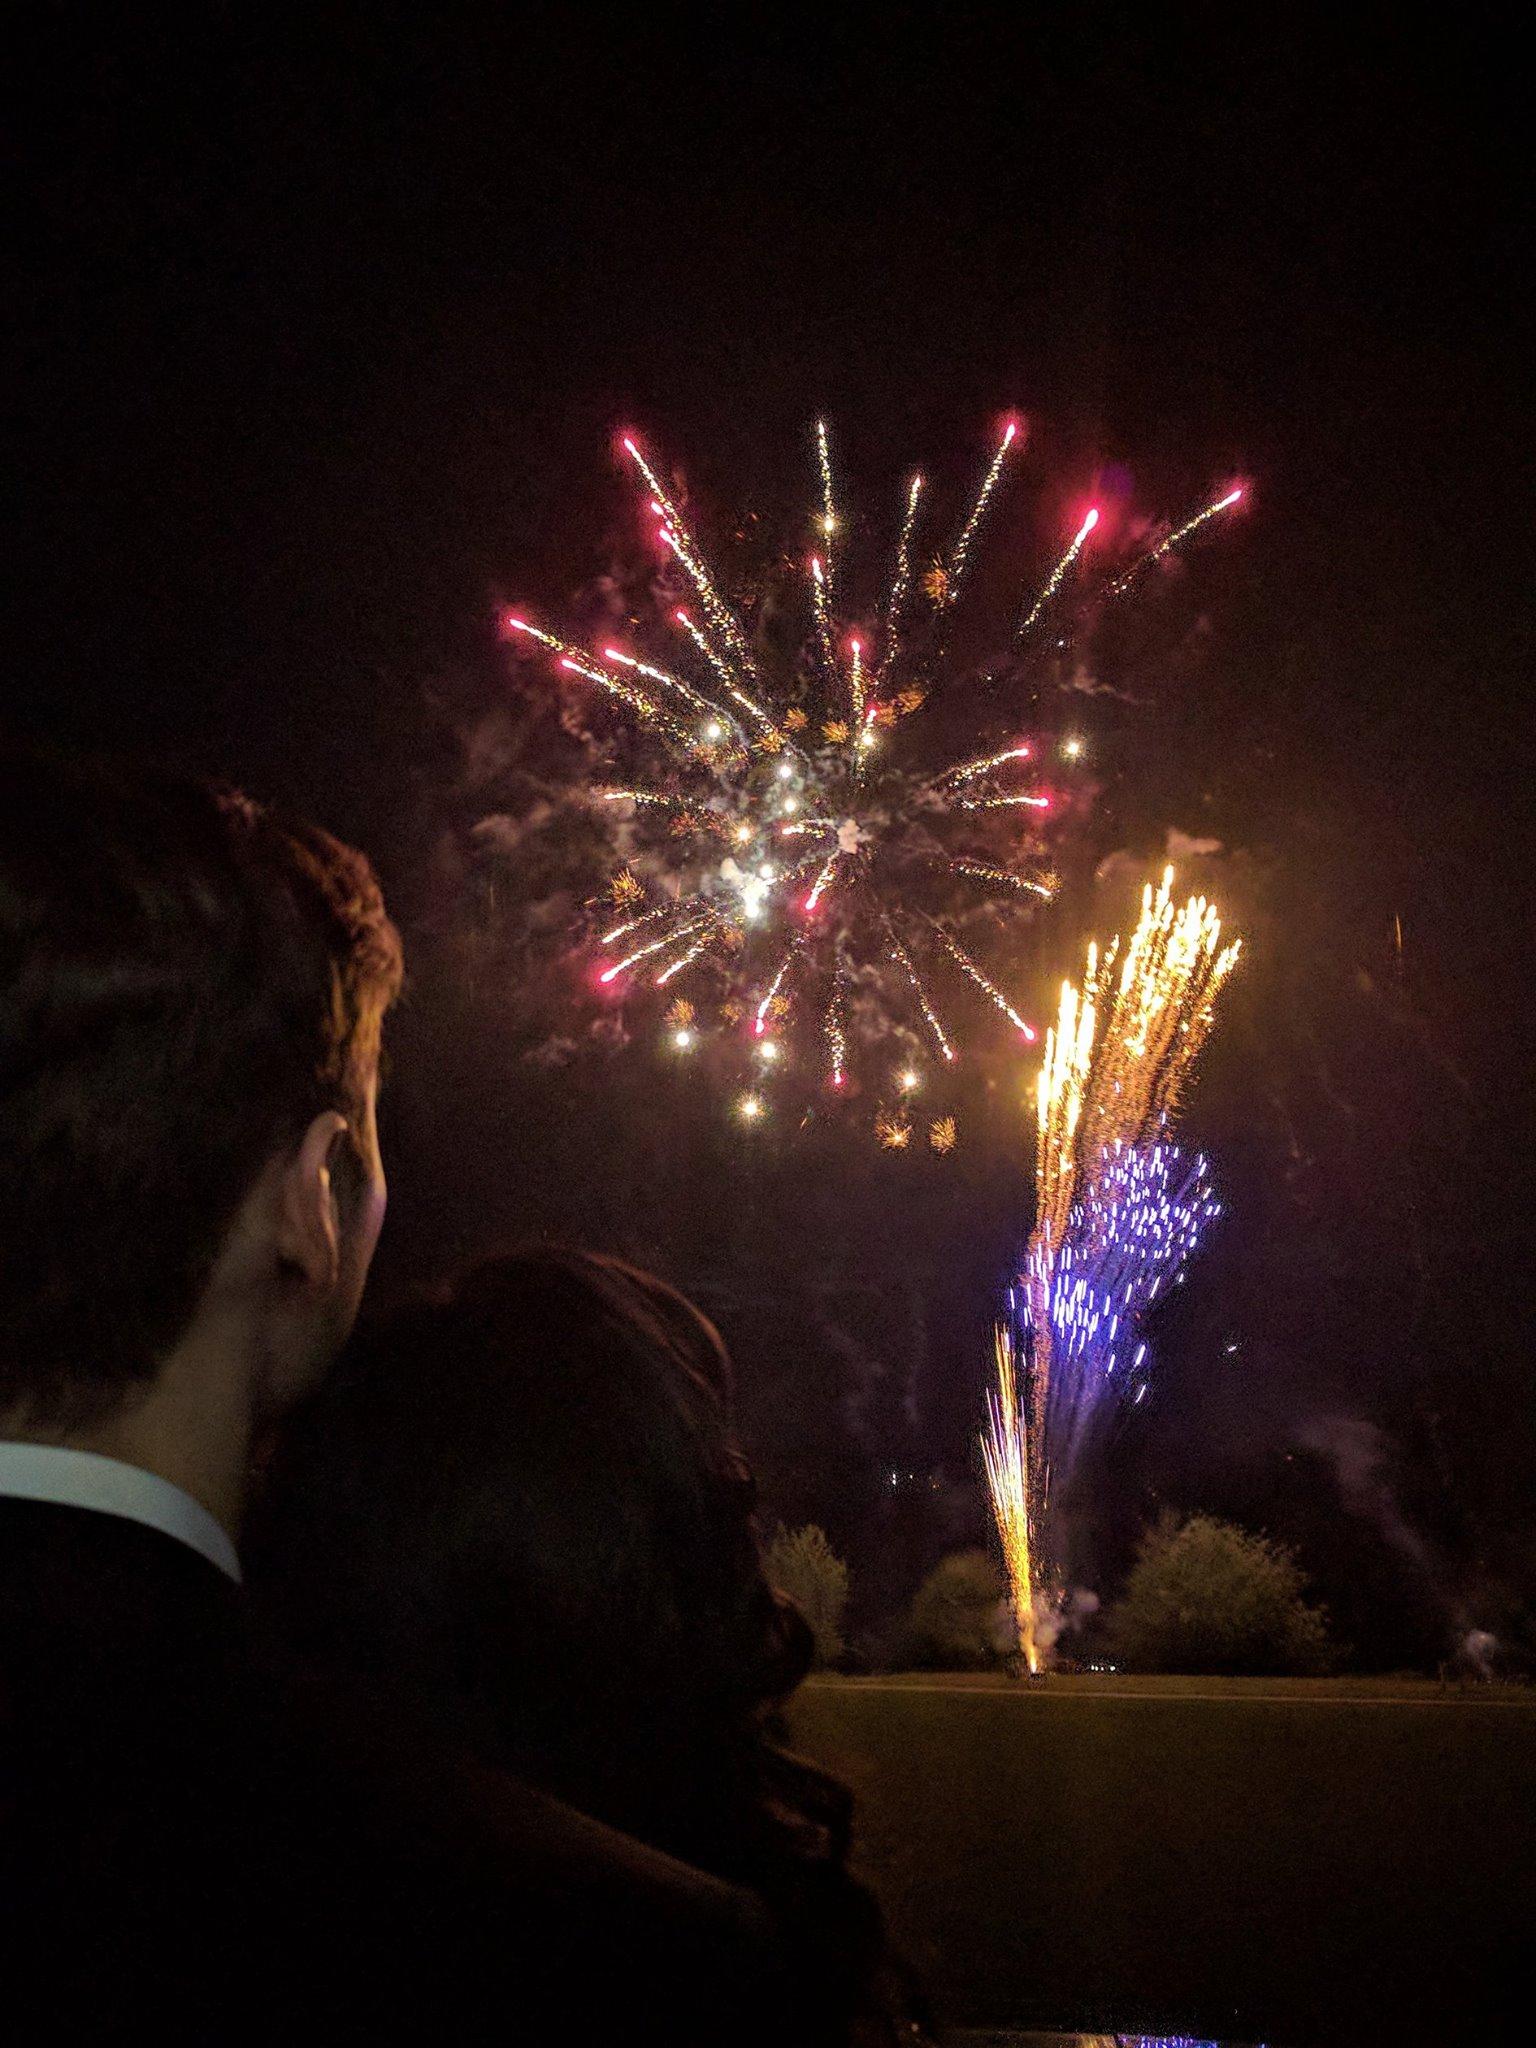 Surprise firework display, Image by Dustin Moris Gorski